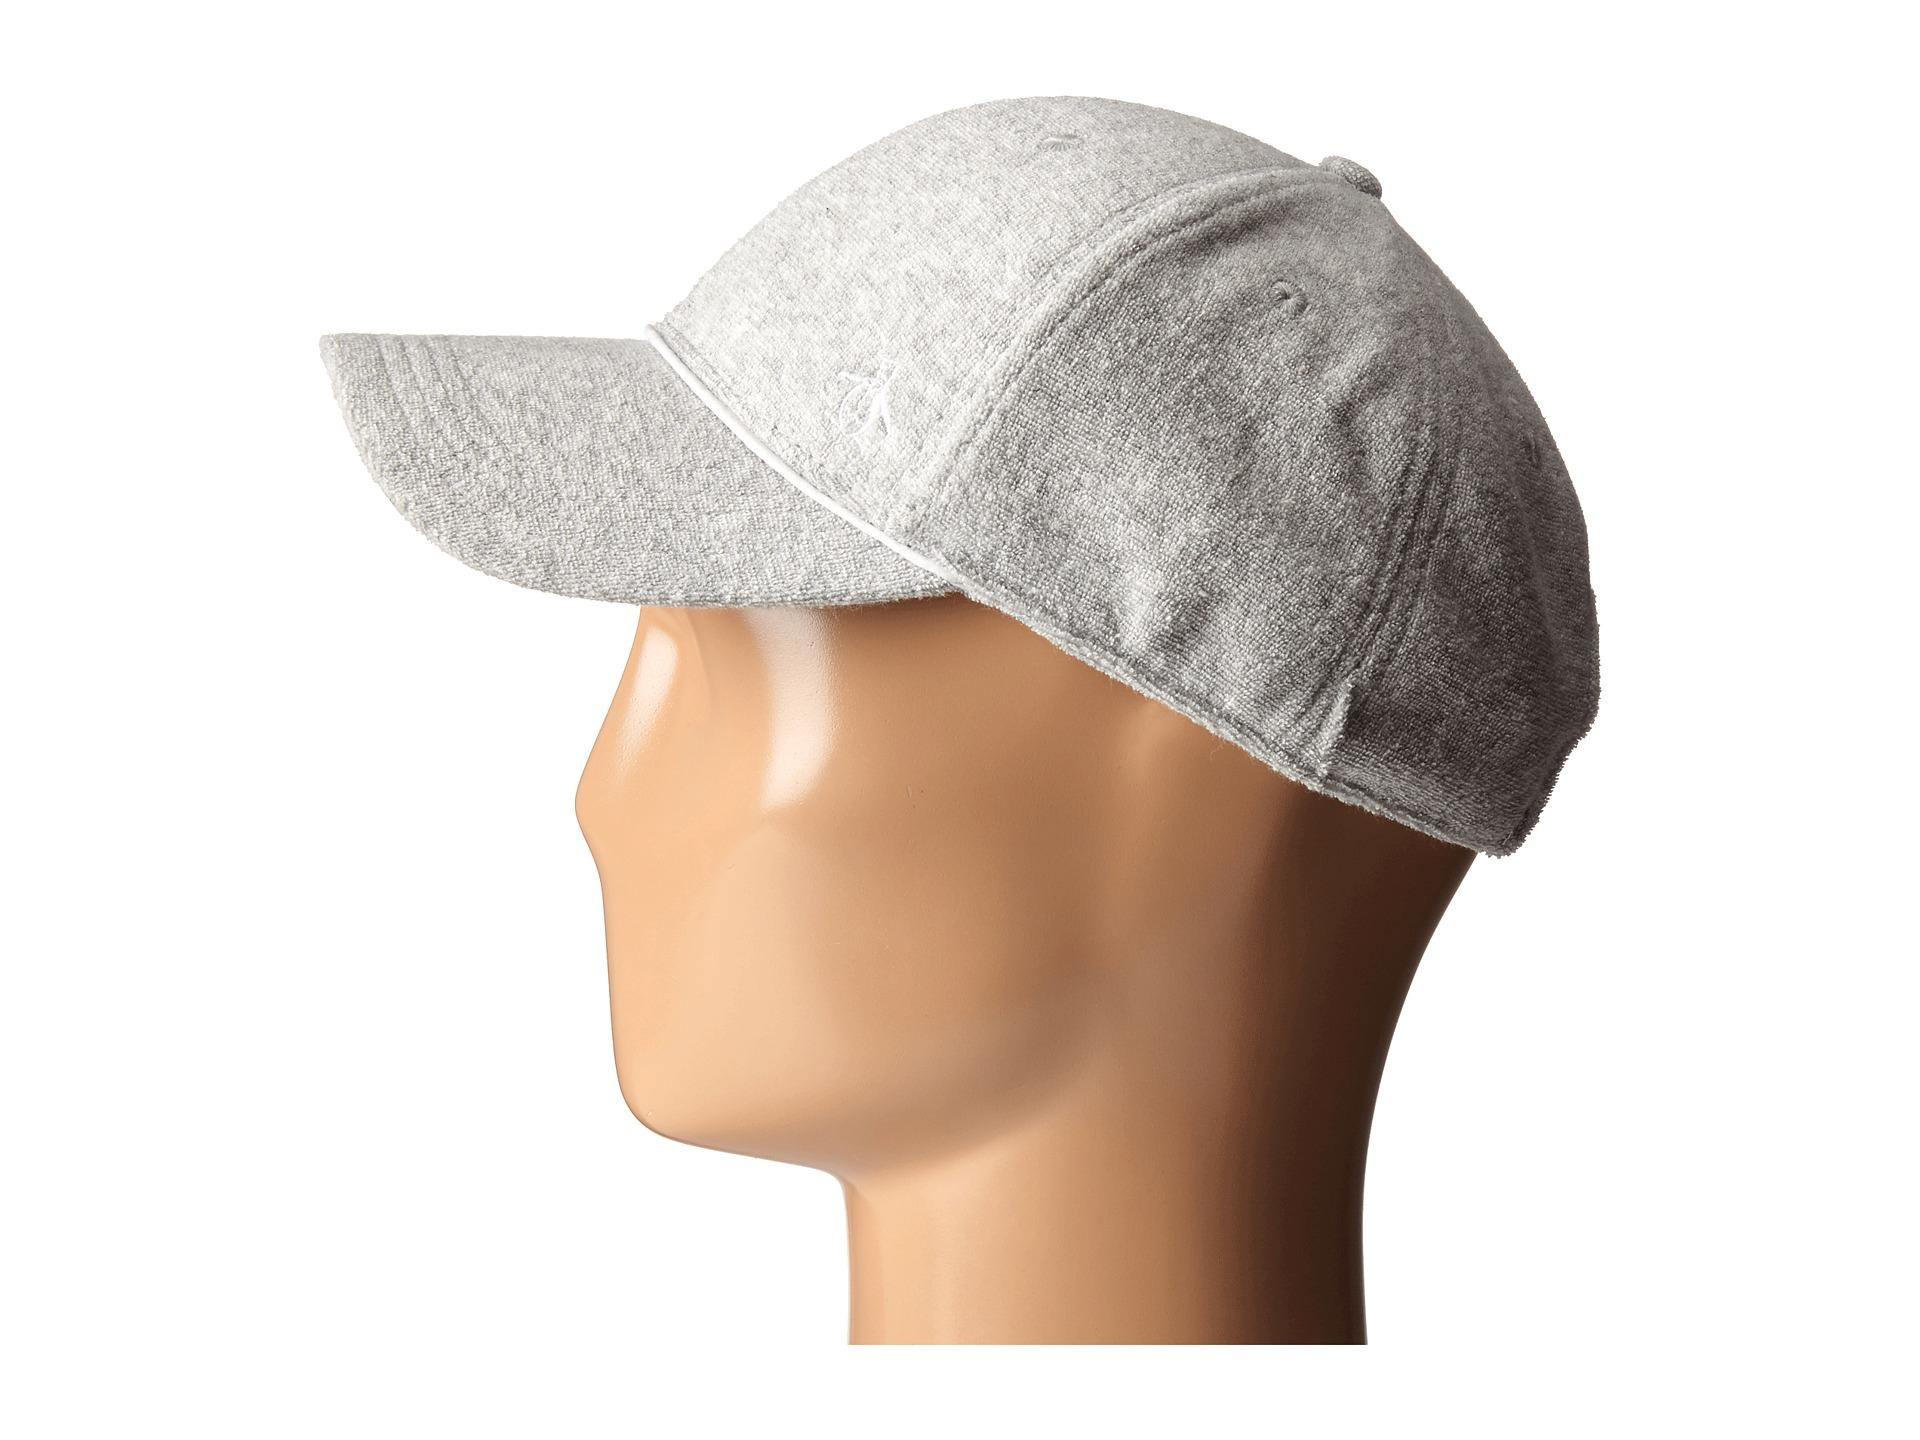 Lyst - Original Penguin Terry Cloth Baseball Cap in Gray for Men f868f73b37a